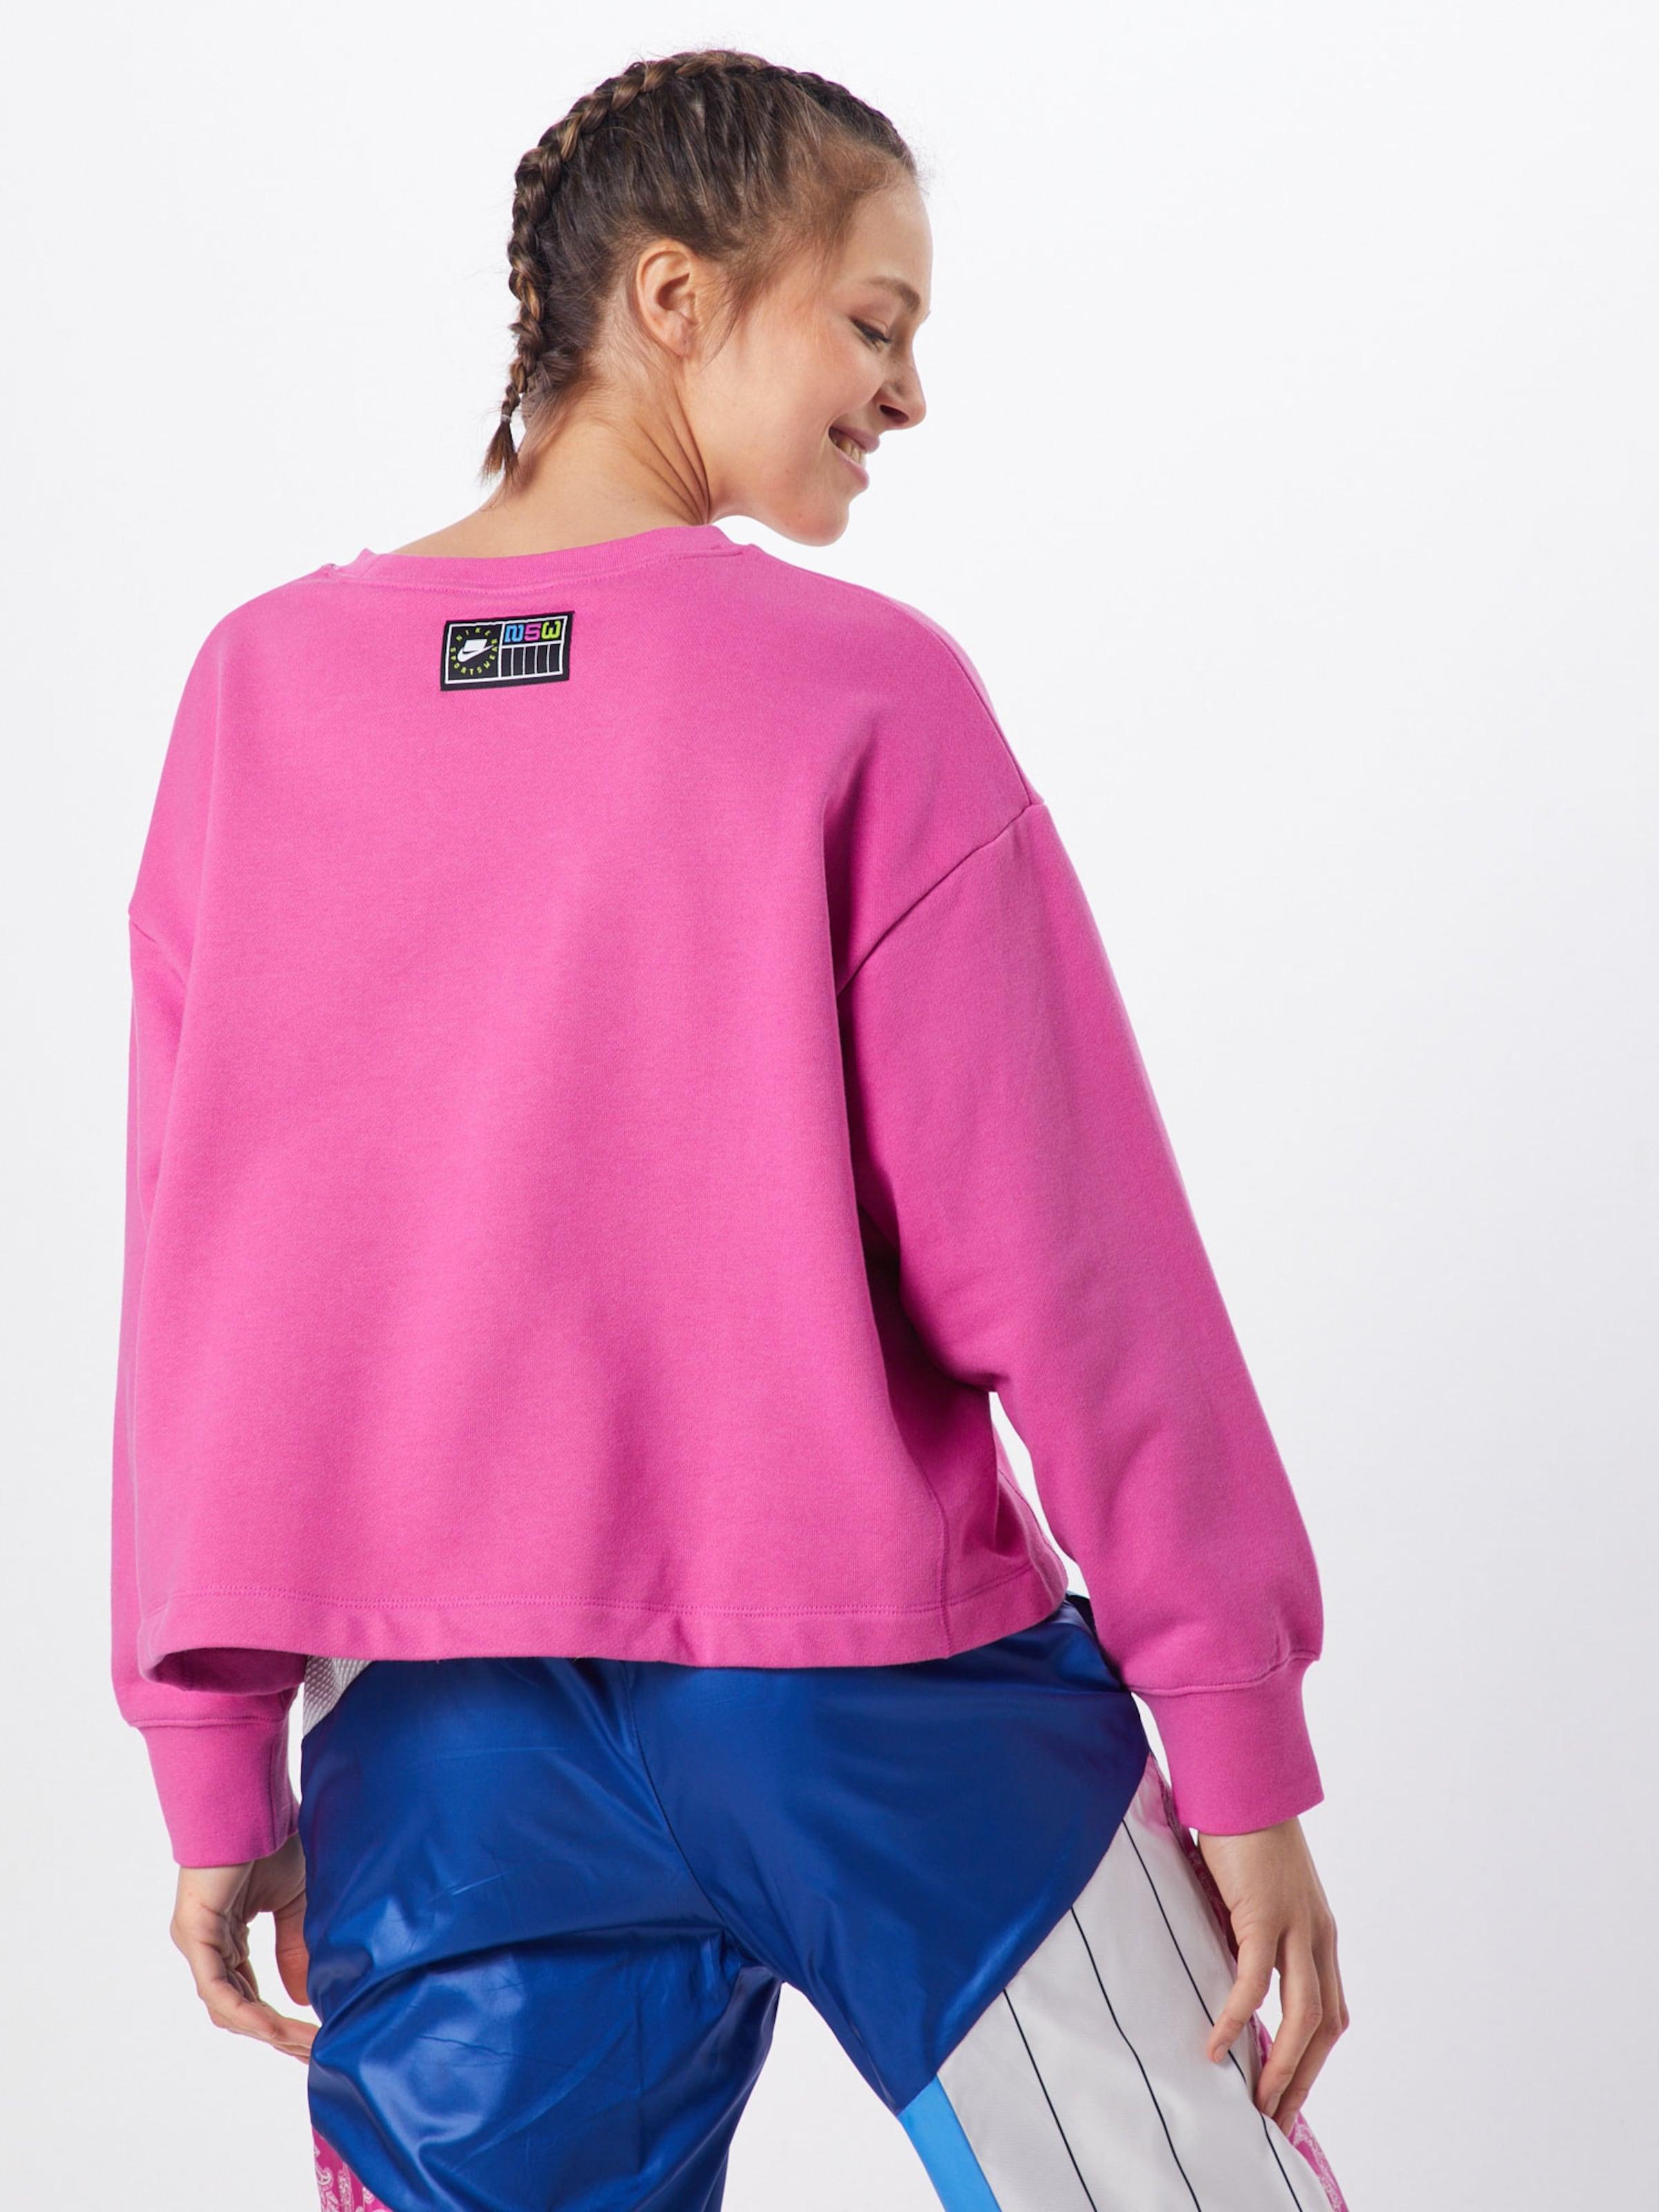 Sportswear Nike Blanc Sweat FluoRose shirt Vert En Y7vbf6yg